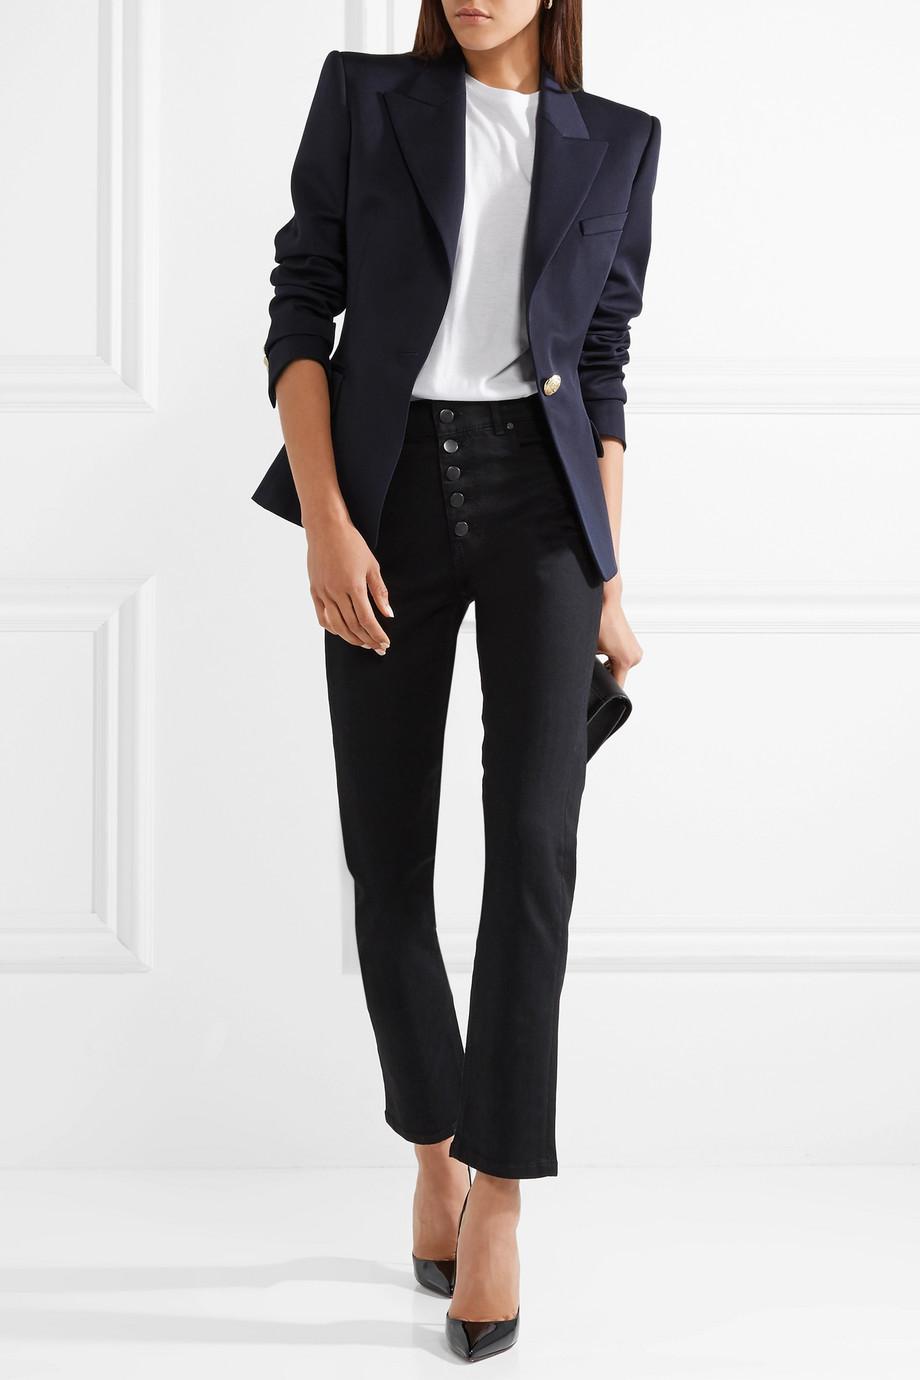 Balmain Wool-twill blazer with internal shoulder pads $2,095